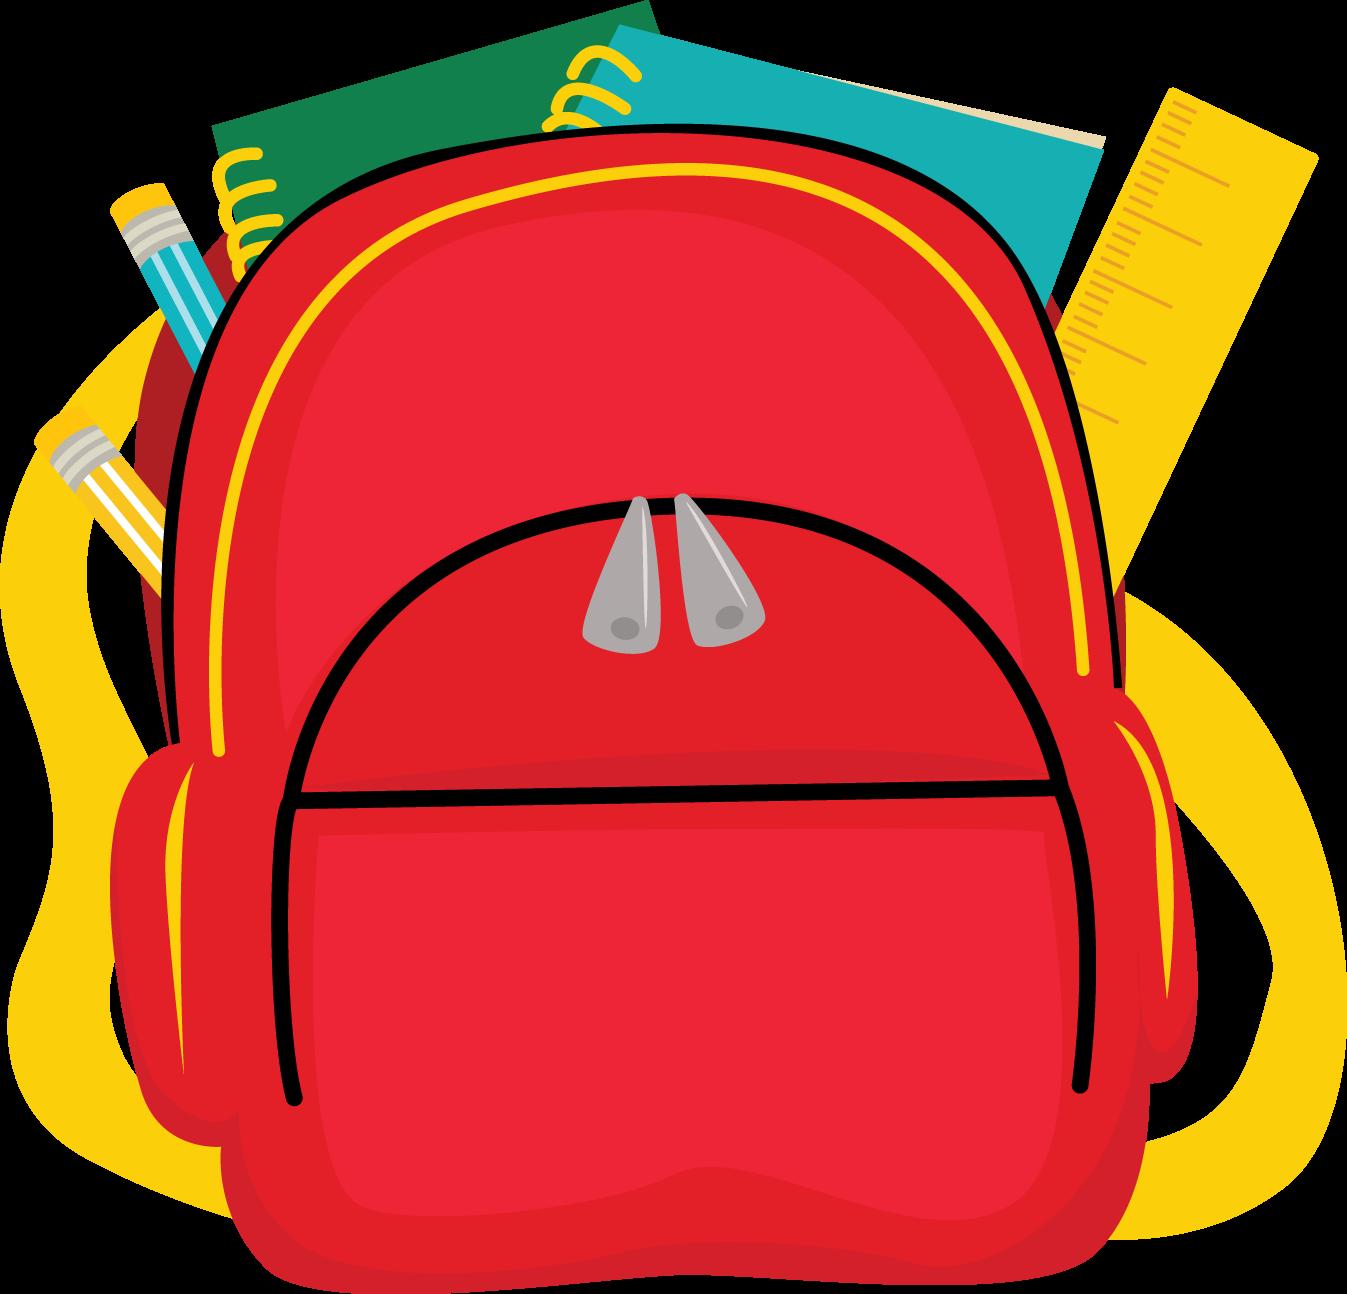 School backpack clip art. Bag clipart homework